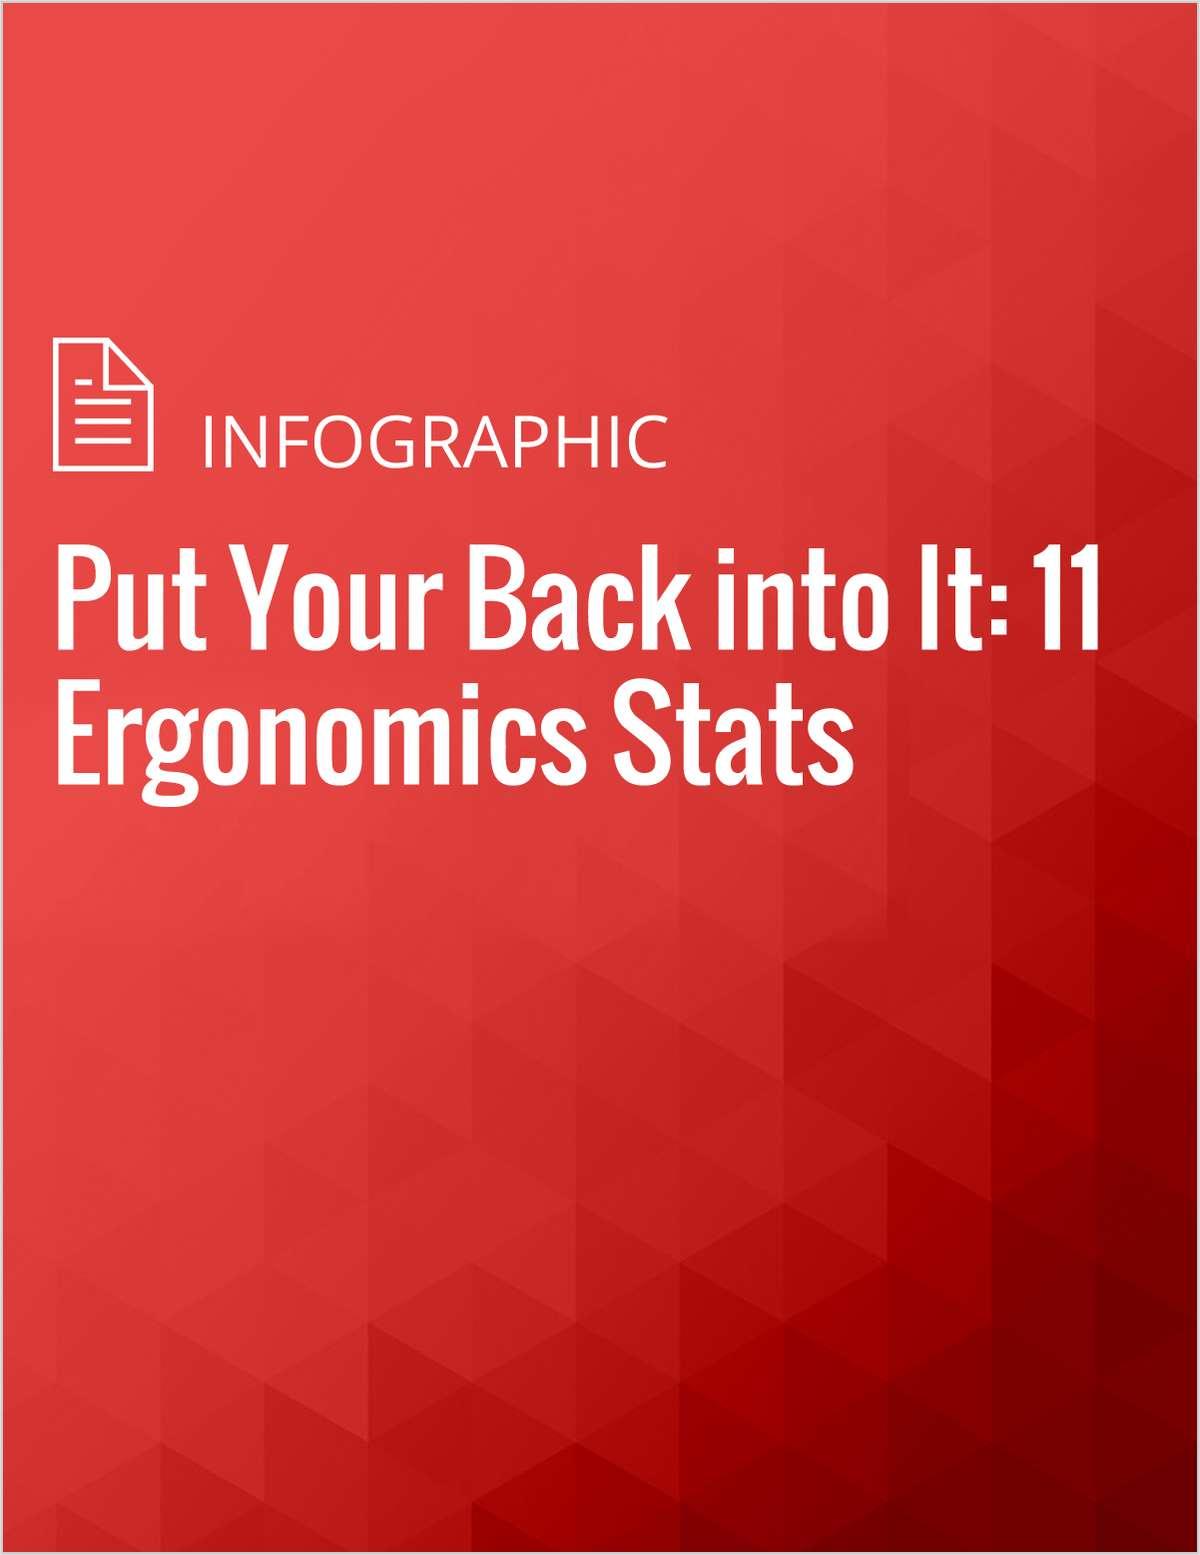 Put Your Back into It: 11 Ergonomics Stats